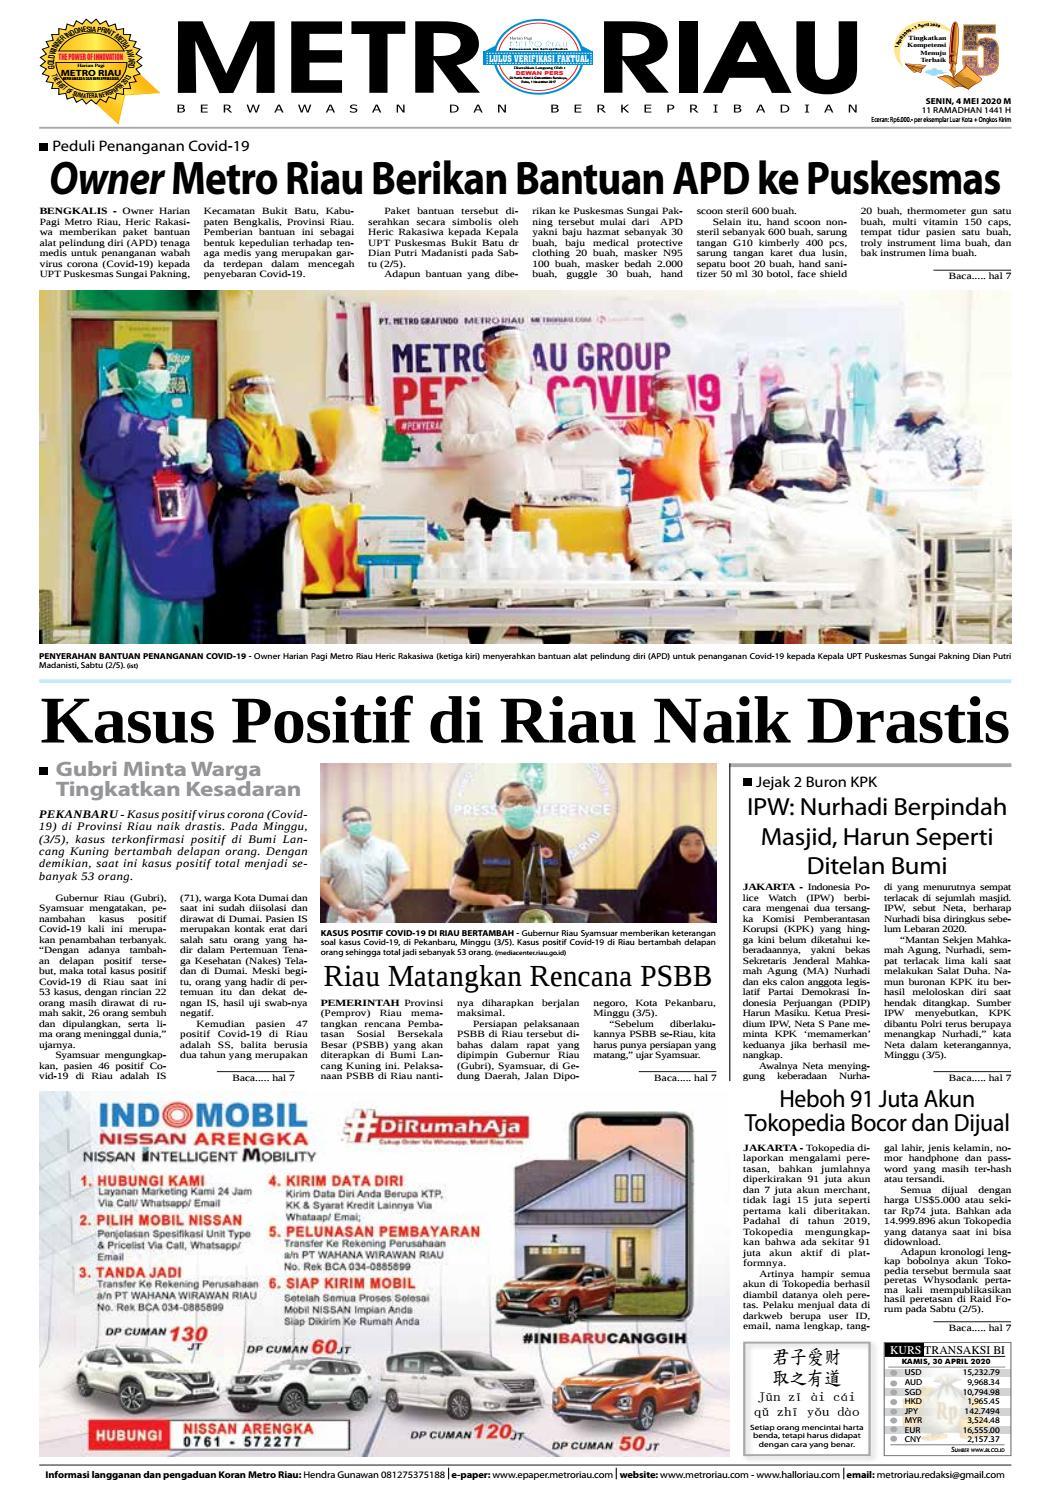 Metroriau Edisi 04 Mei 2020 By Harian Pagi Metro Riau Issuu